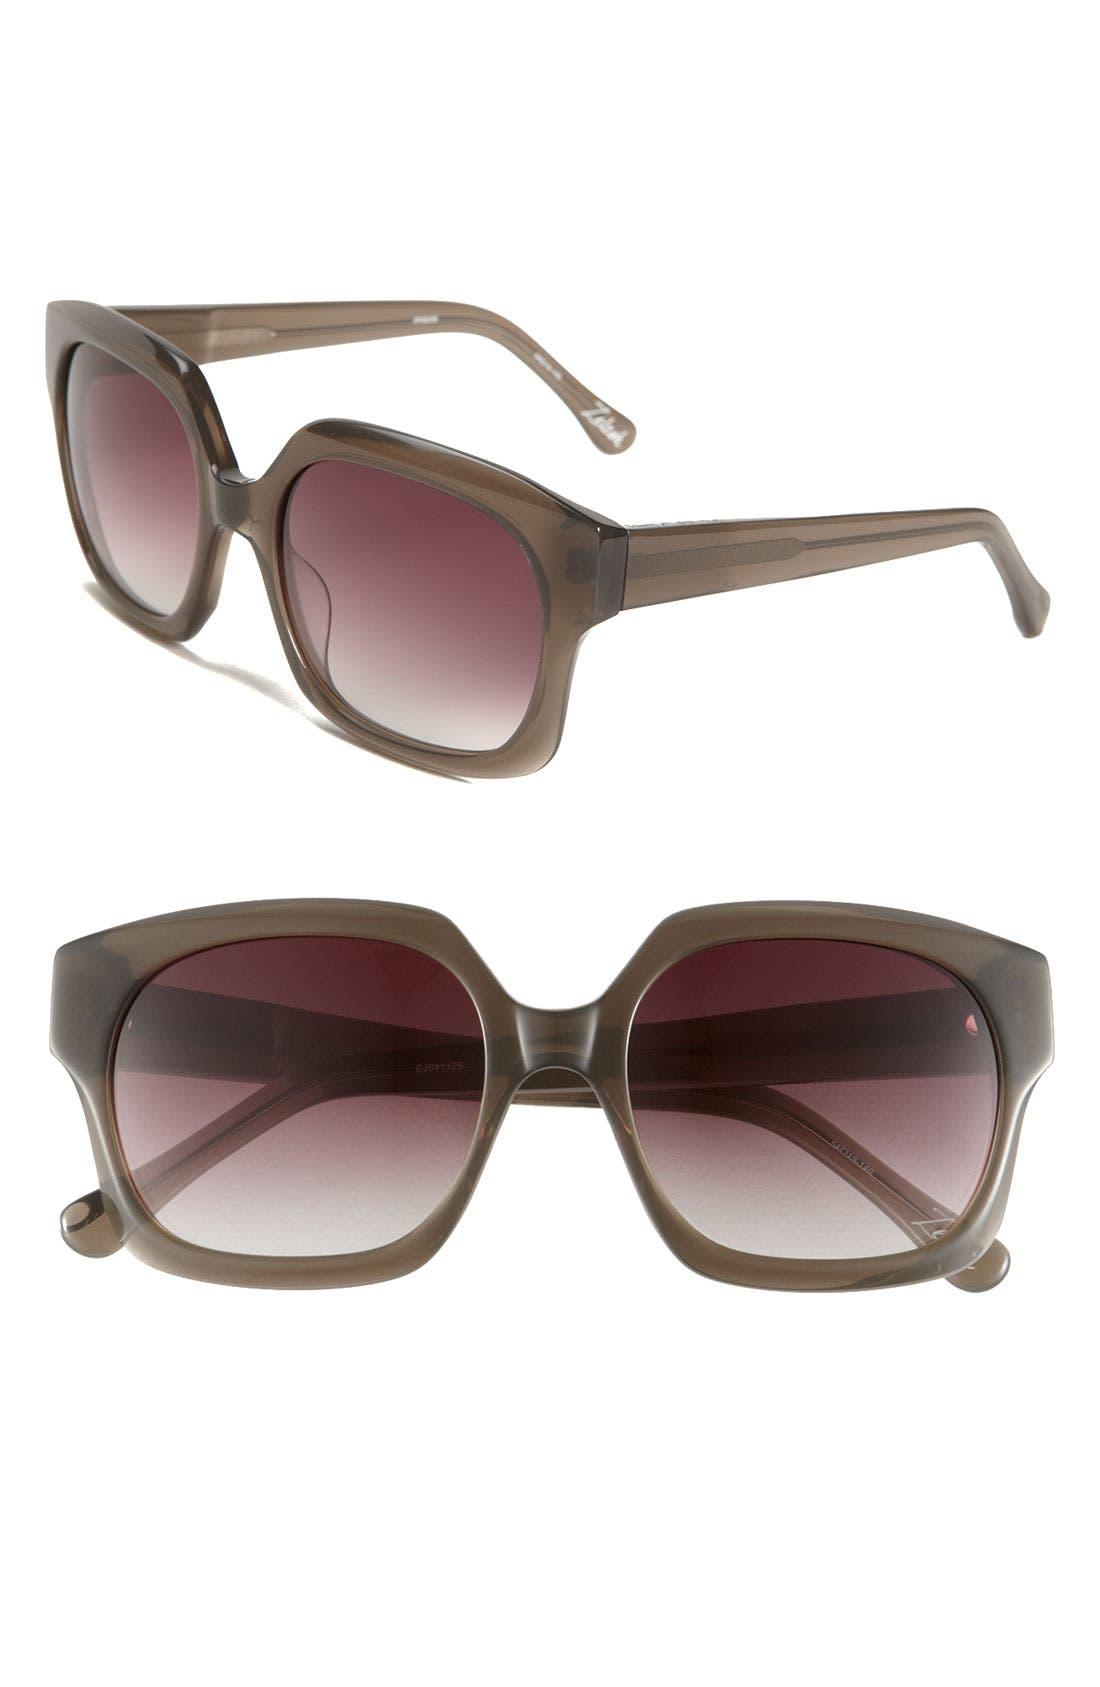 Alternate Image 1 Selected - Elizabeth and James 'Zelzah' Sunglasses